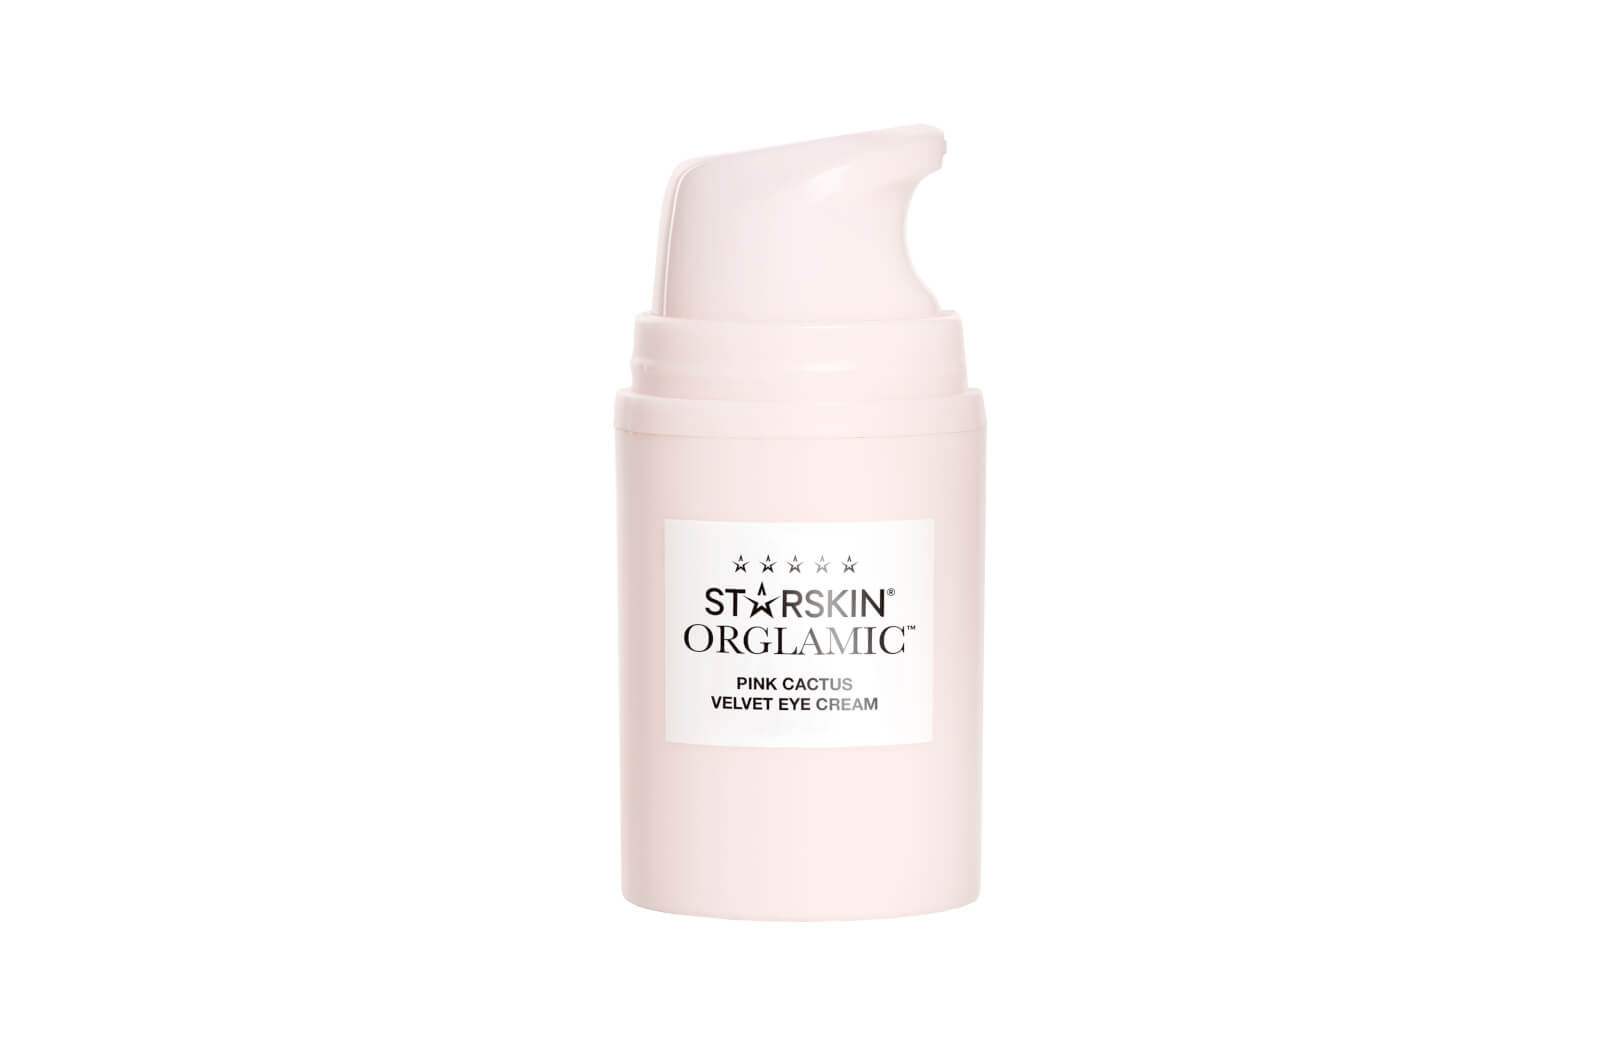 STARSKIN Orglamic Pink Cactus Velvet Eye Cream Smooth and Repair 15ml